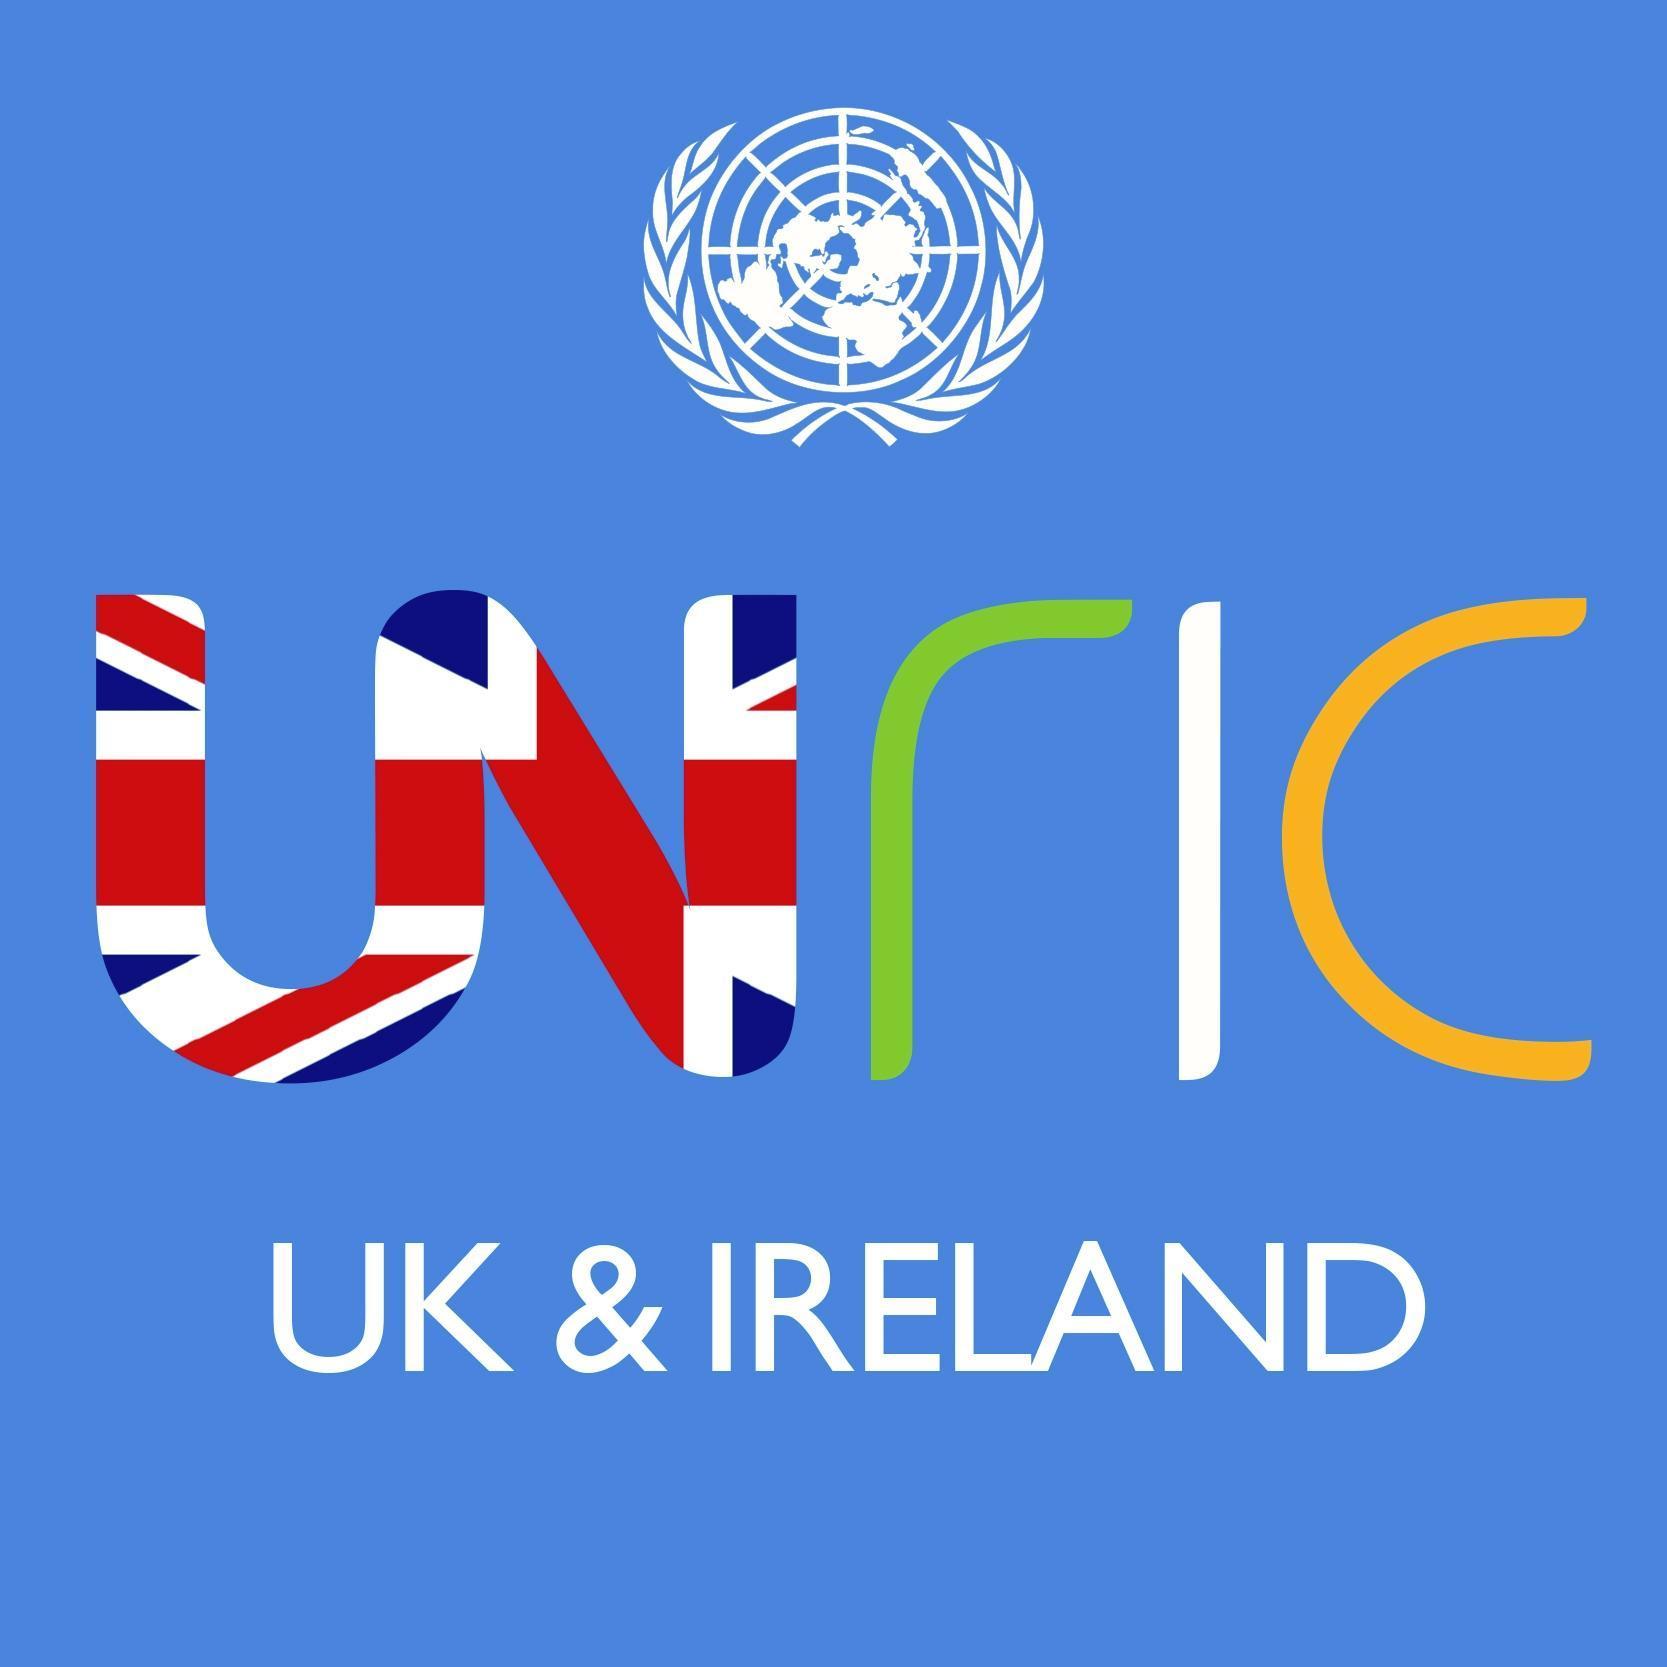 The uk and ireland